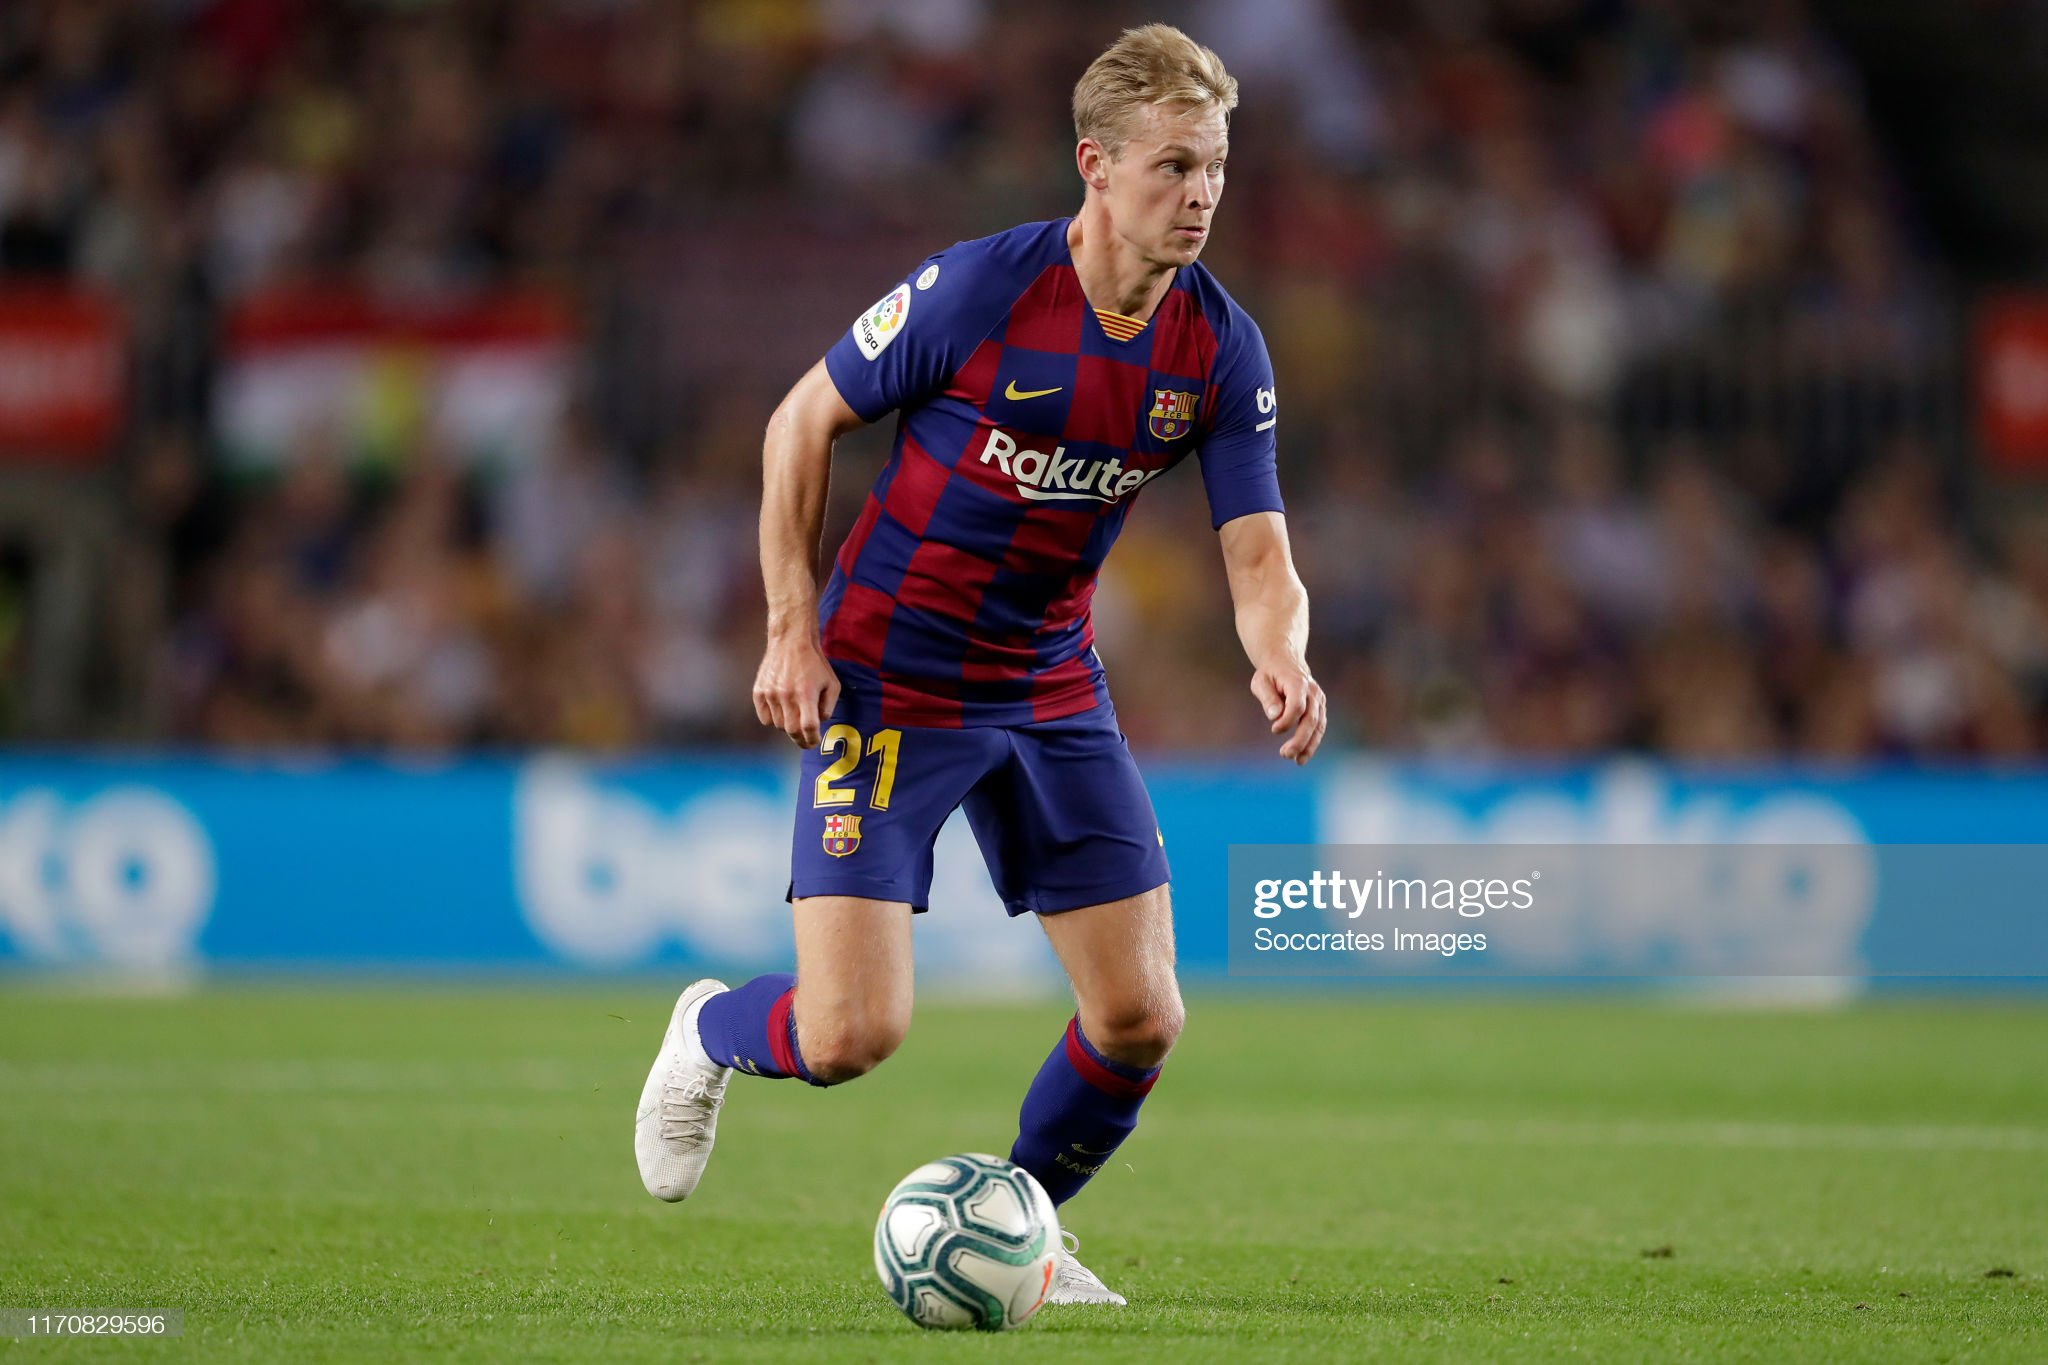 صور مباراة : برشلونة - فياريال 2-1 ( 24-09-2019 )  Frenkie-de-jong-of-fc-barcelona-during-the-la-liga-santander-match-picture-id1170829596?s=2048x2048